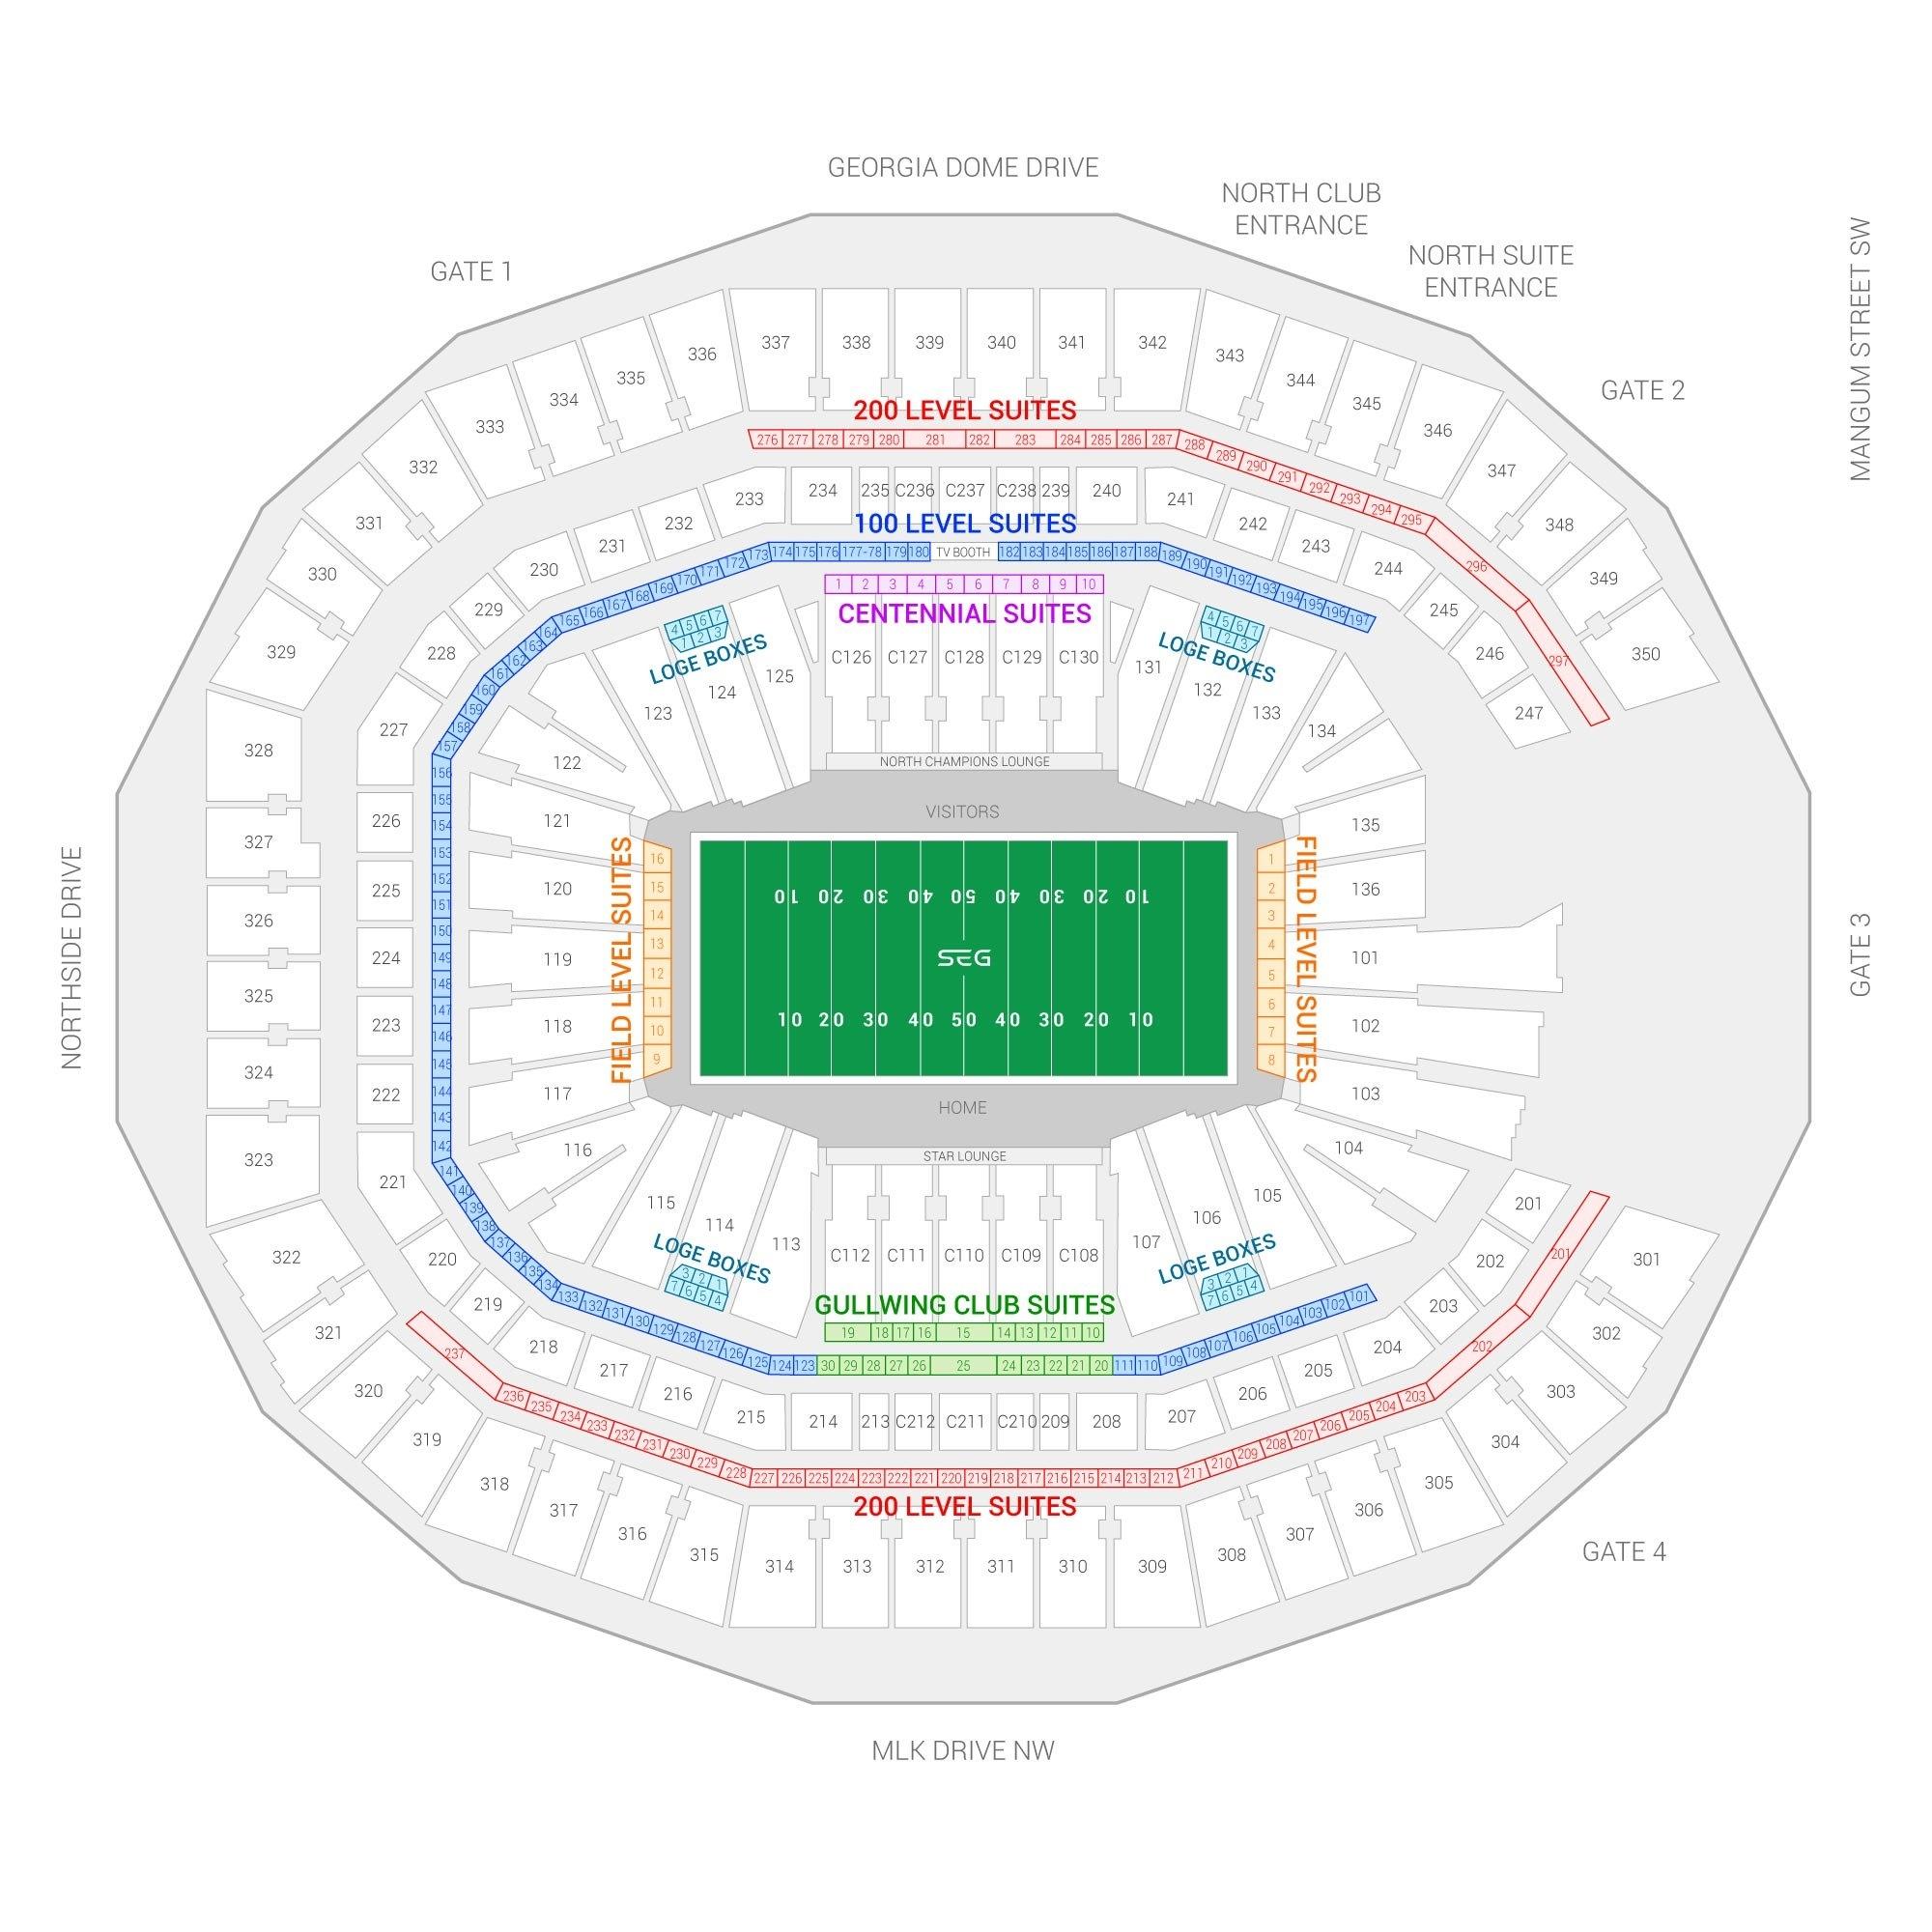 Super Bowl Liii Suite Rentals | Mercedes-Benz Stadium intended for Super Bowl Seat Map